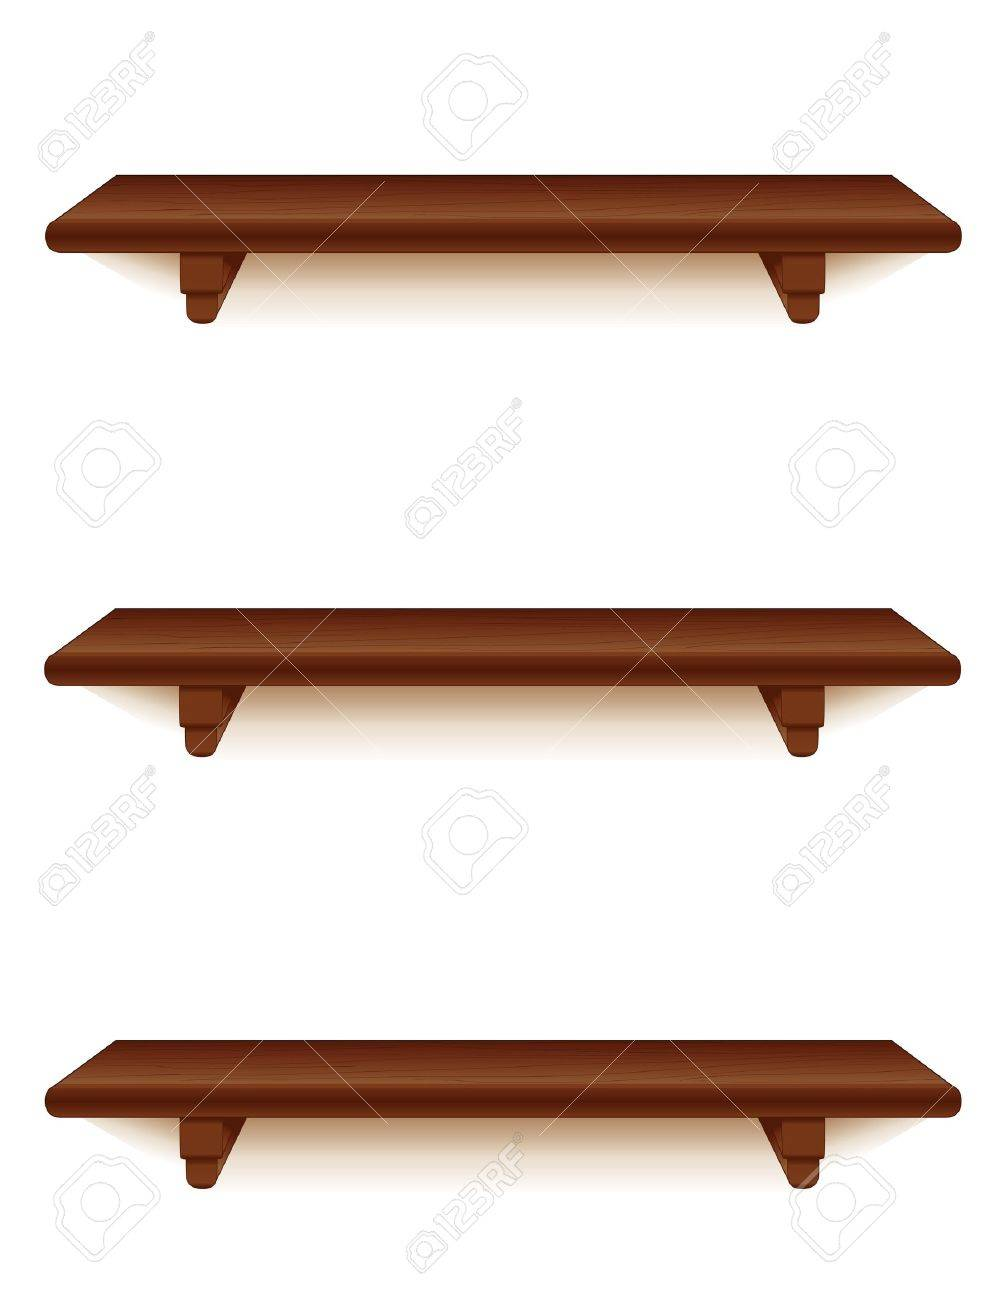 Full Size of Mahagoni Holz Wand Regale Mit Klammern Auf Wei Isoliert Massivholz Bett Unterschrank Bad Sofa Holzfüßen Holzbank Garten Paschen Betten Aus Massivholzküche Regal Regale Holz